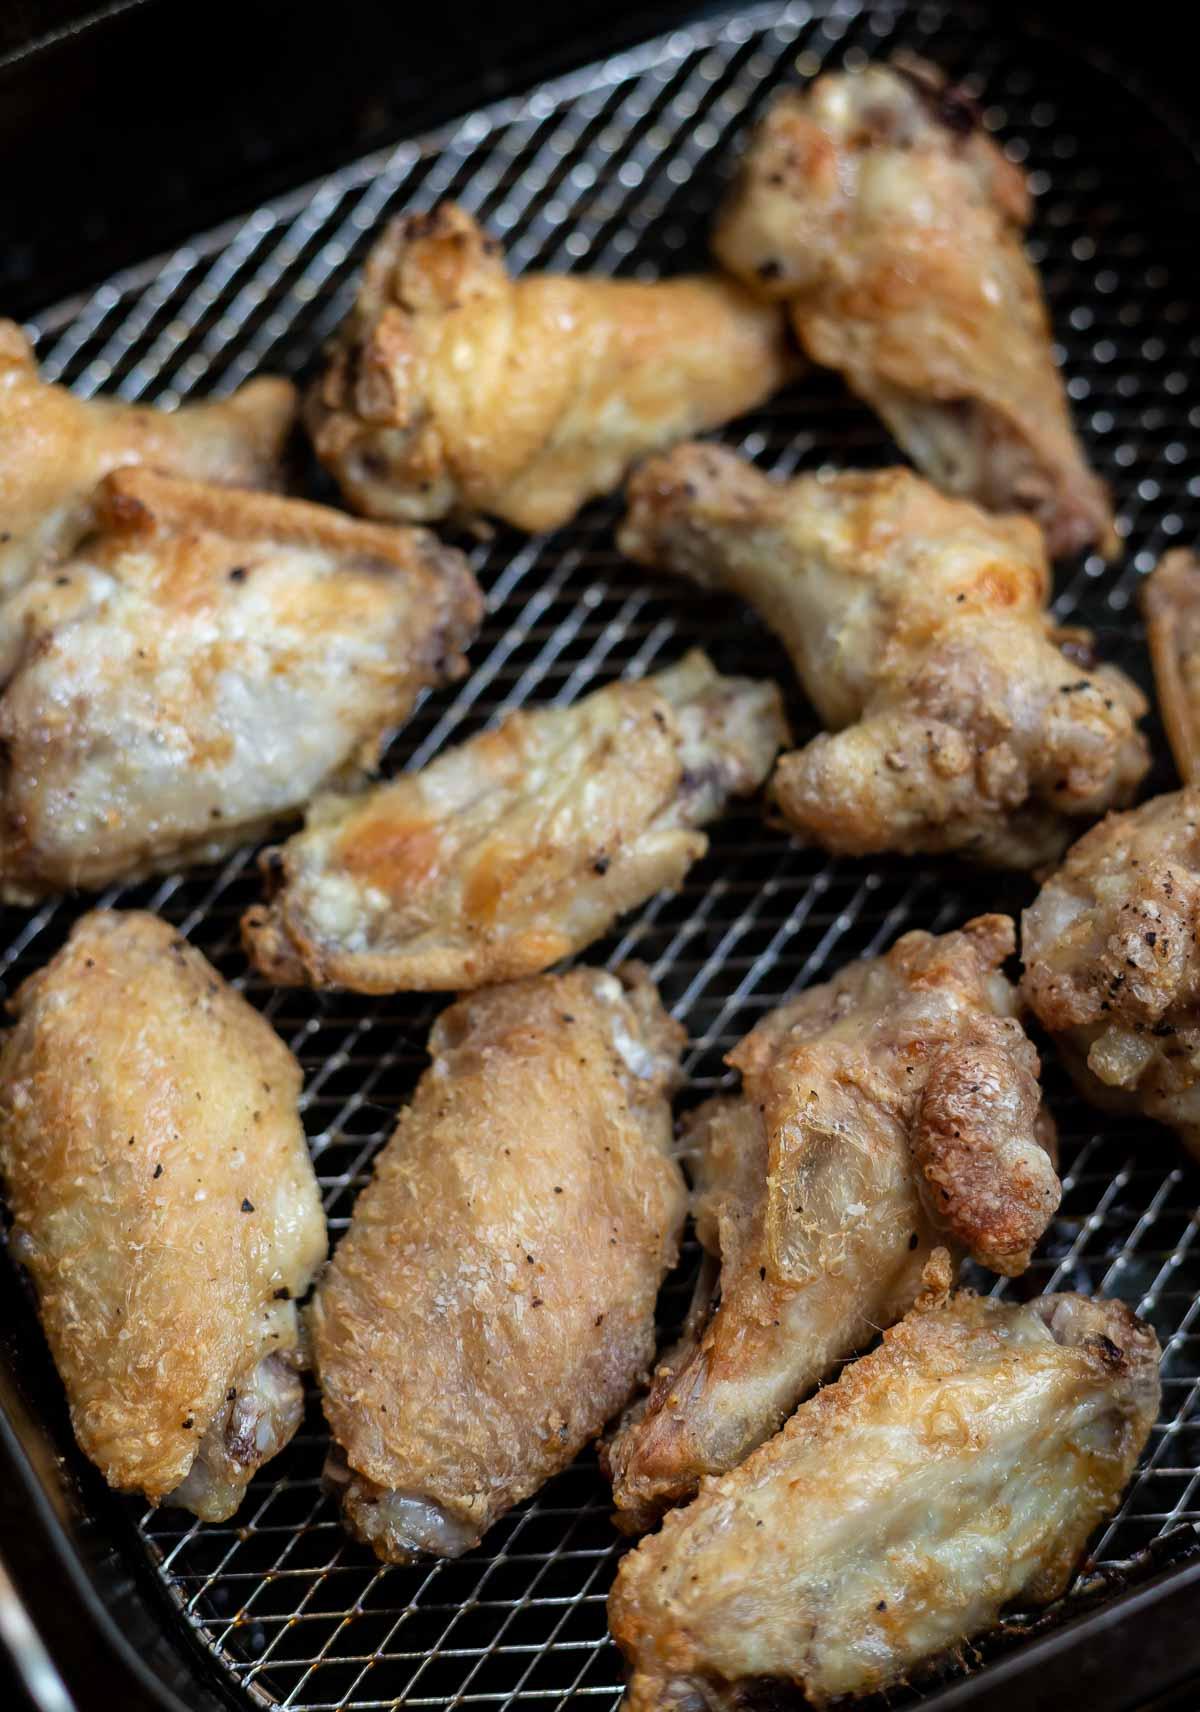 crispy chicken wings in air fryer basket